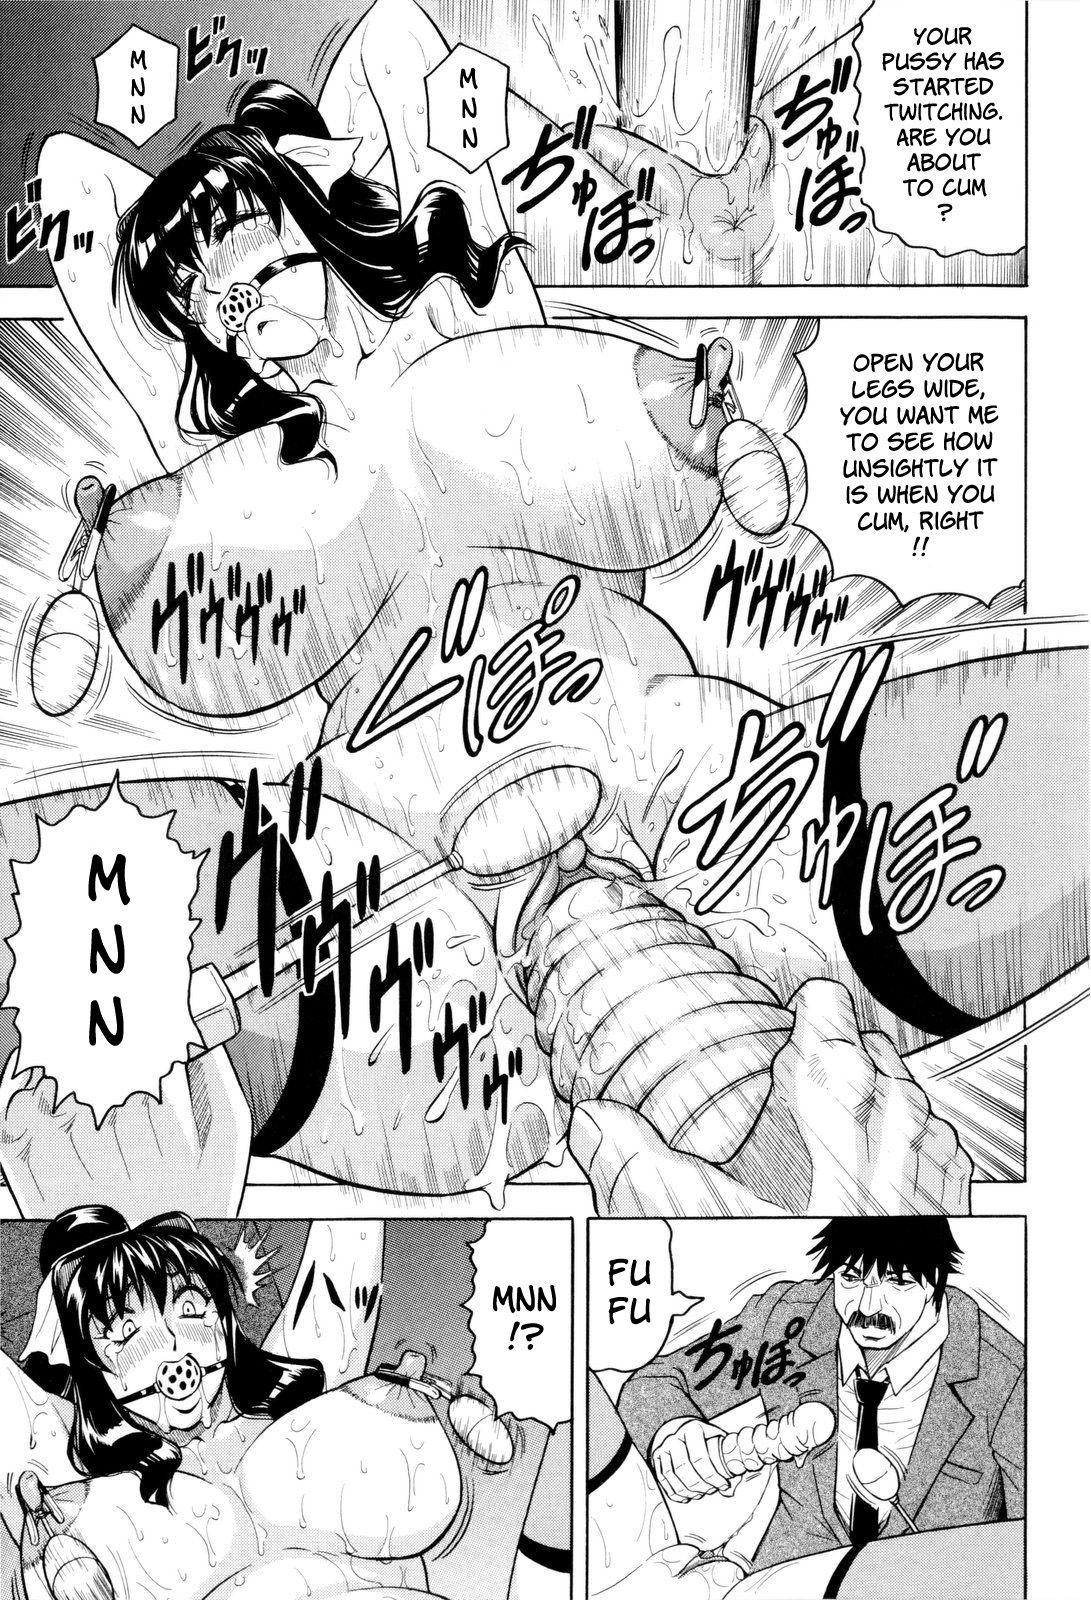 Sensei ni Dashitee! - It ejaculates in the teacher! 154